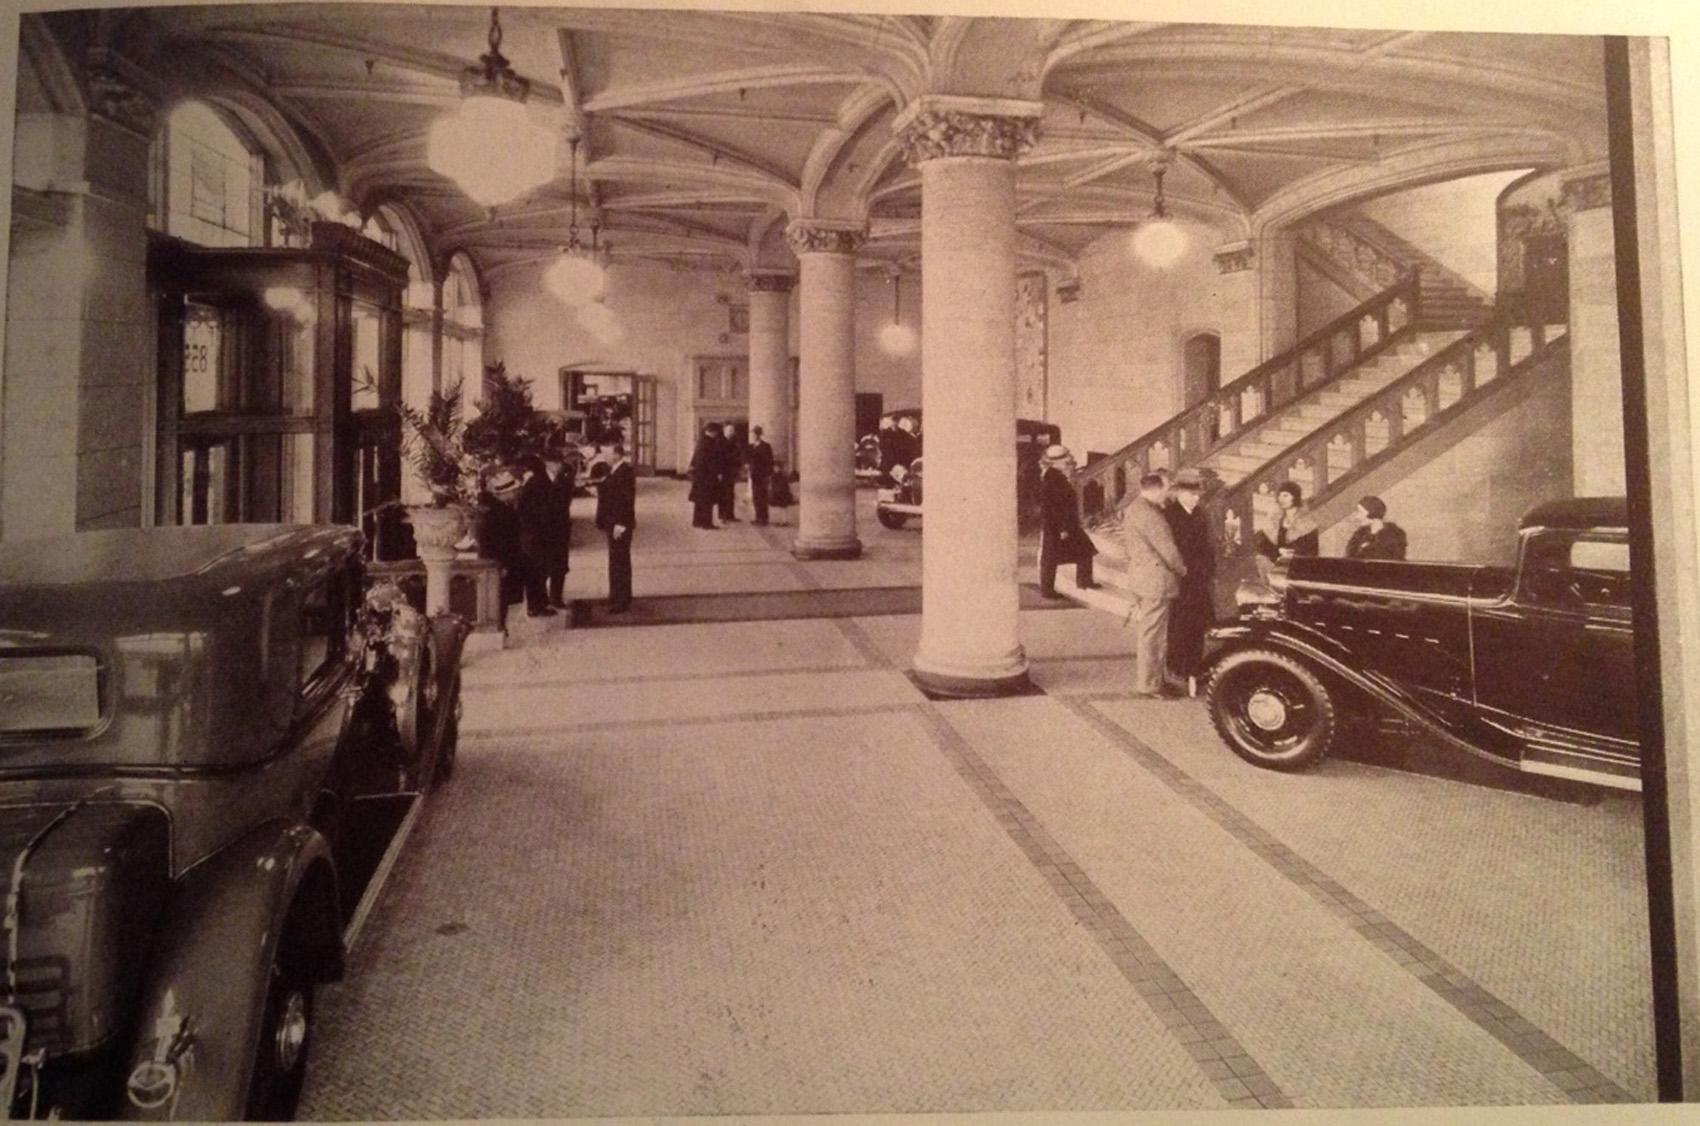 Photos: A Look Back At Commonwealth Avenue's 'Auto Row' | WBUR News